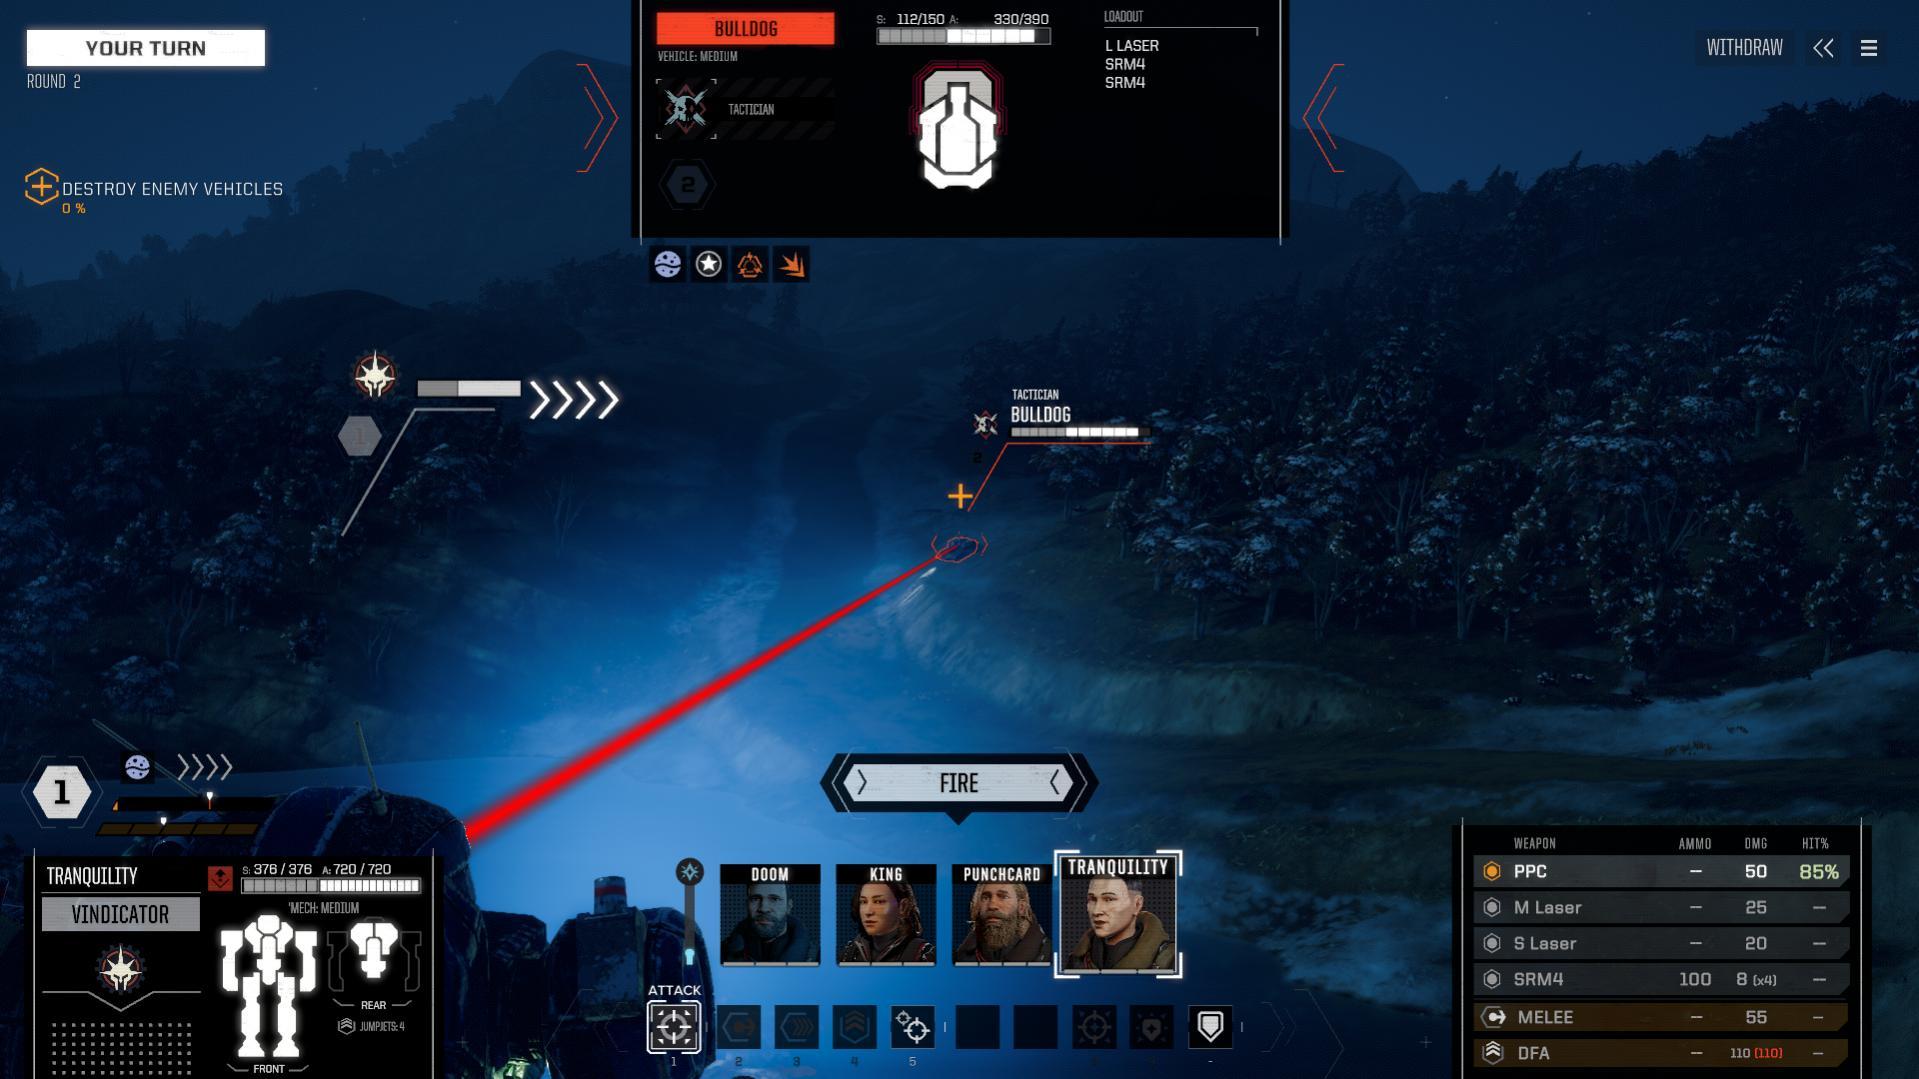 Battletech Heavy Metal DLC review by Rick Moscatello-abtechvehic-jpg